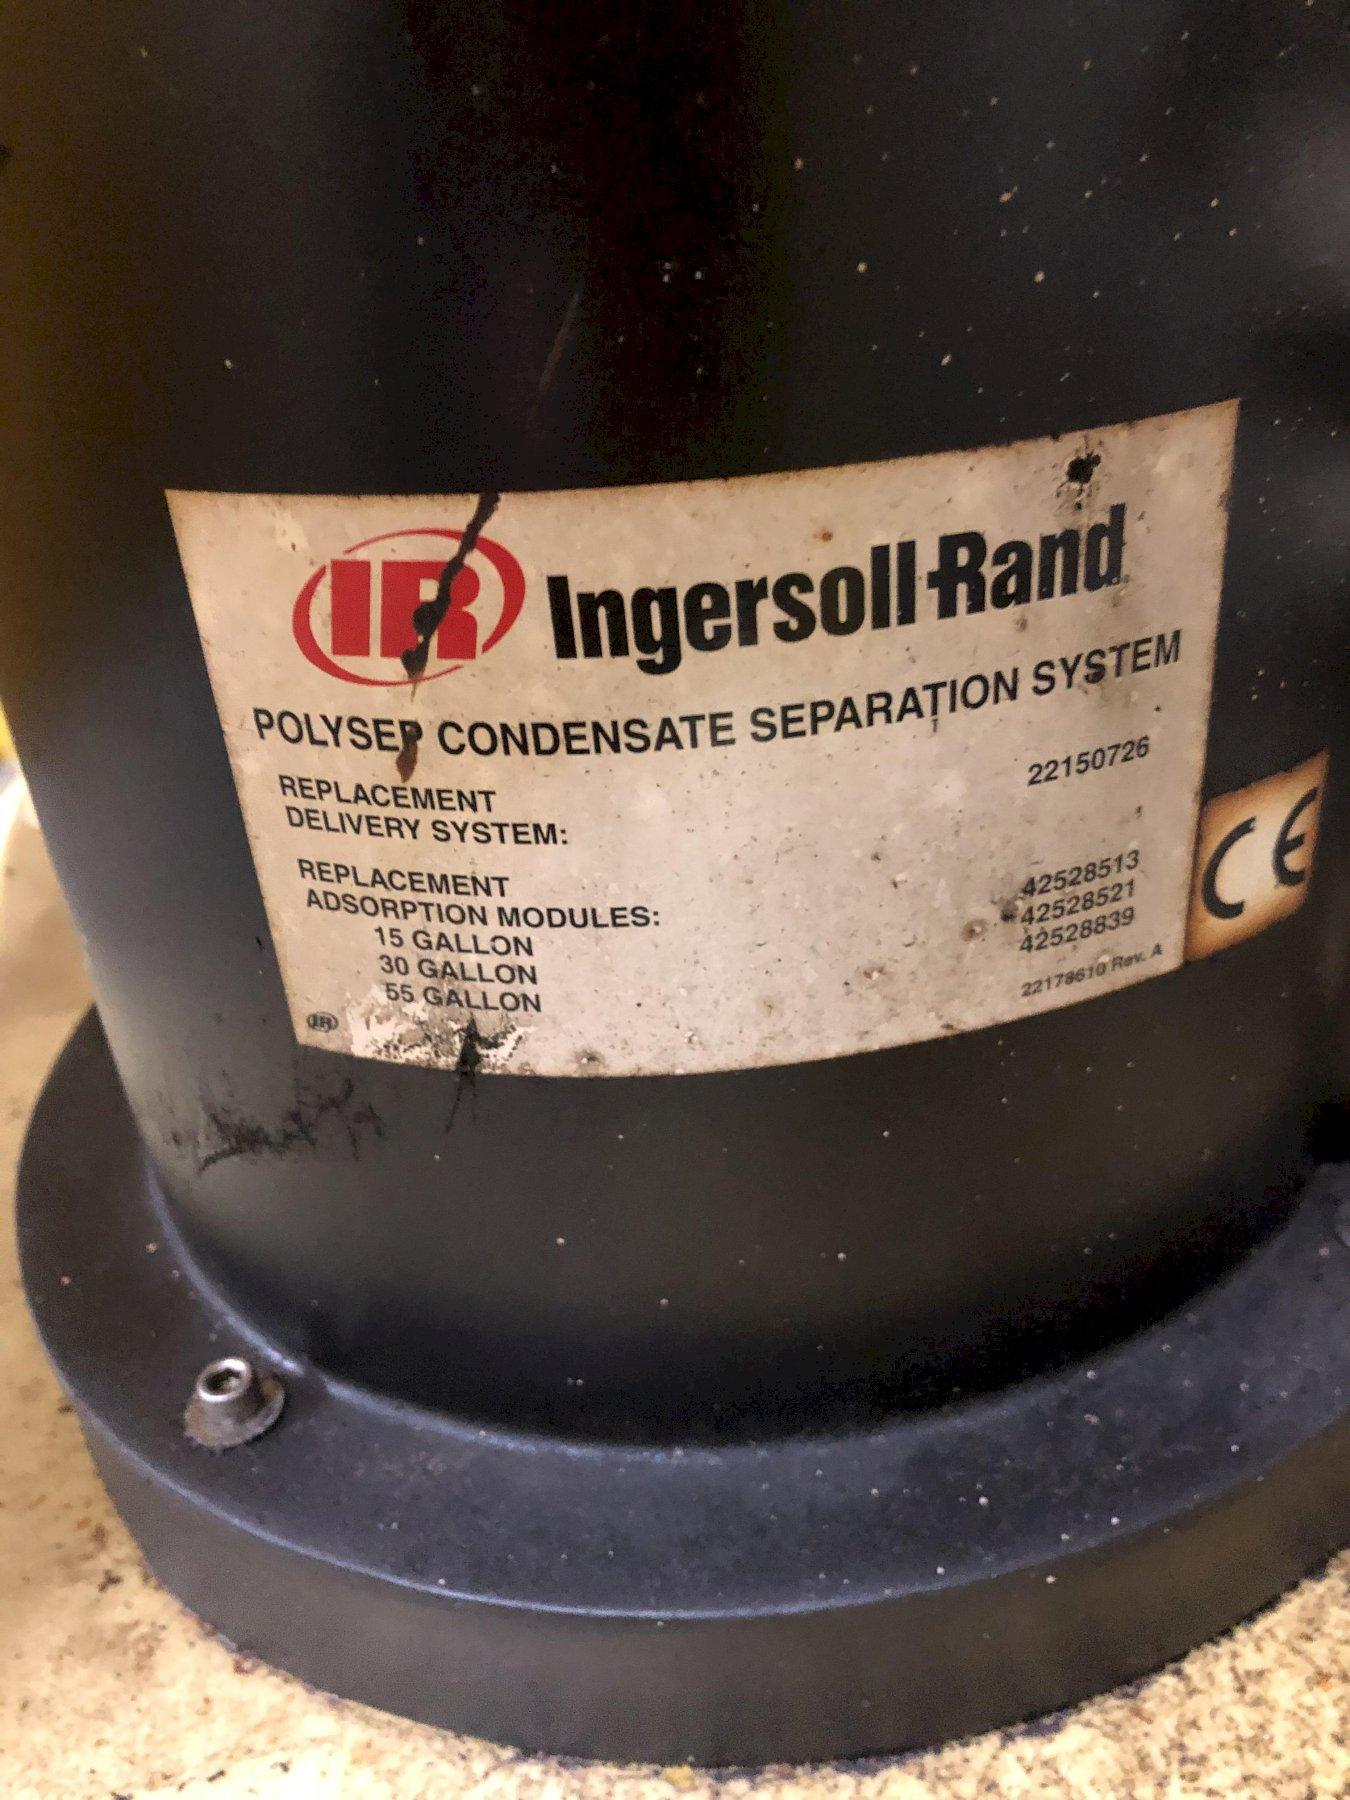 Ingersol Rand polysep condensate separation system